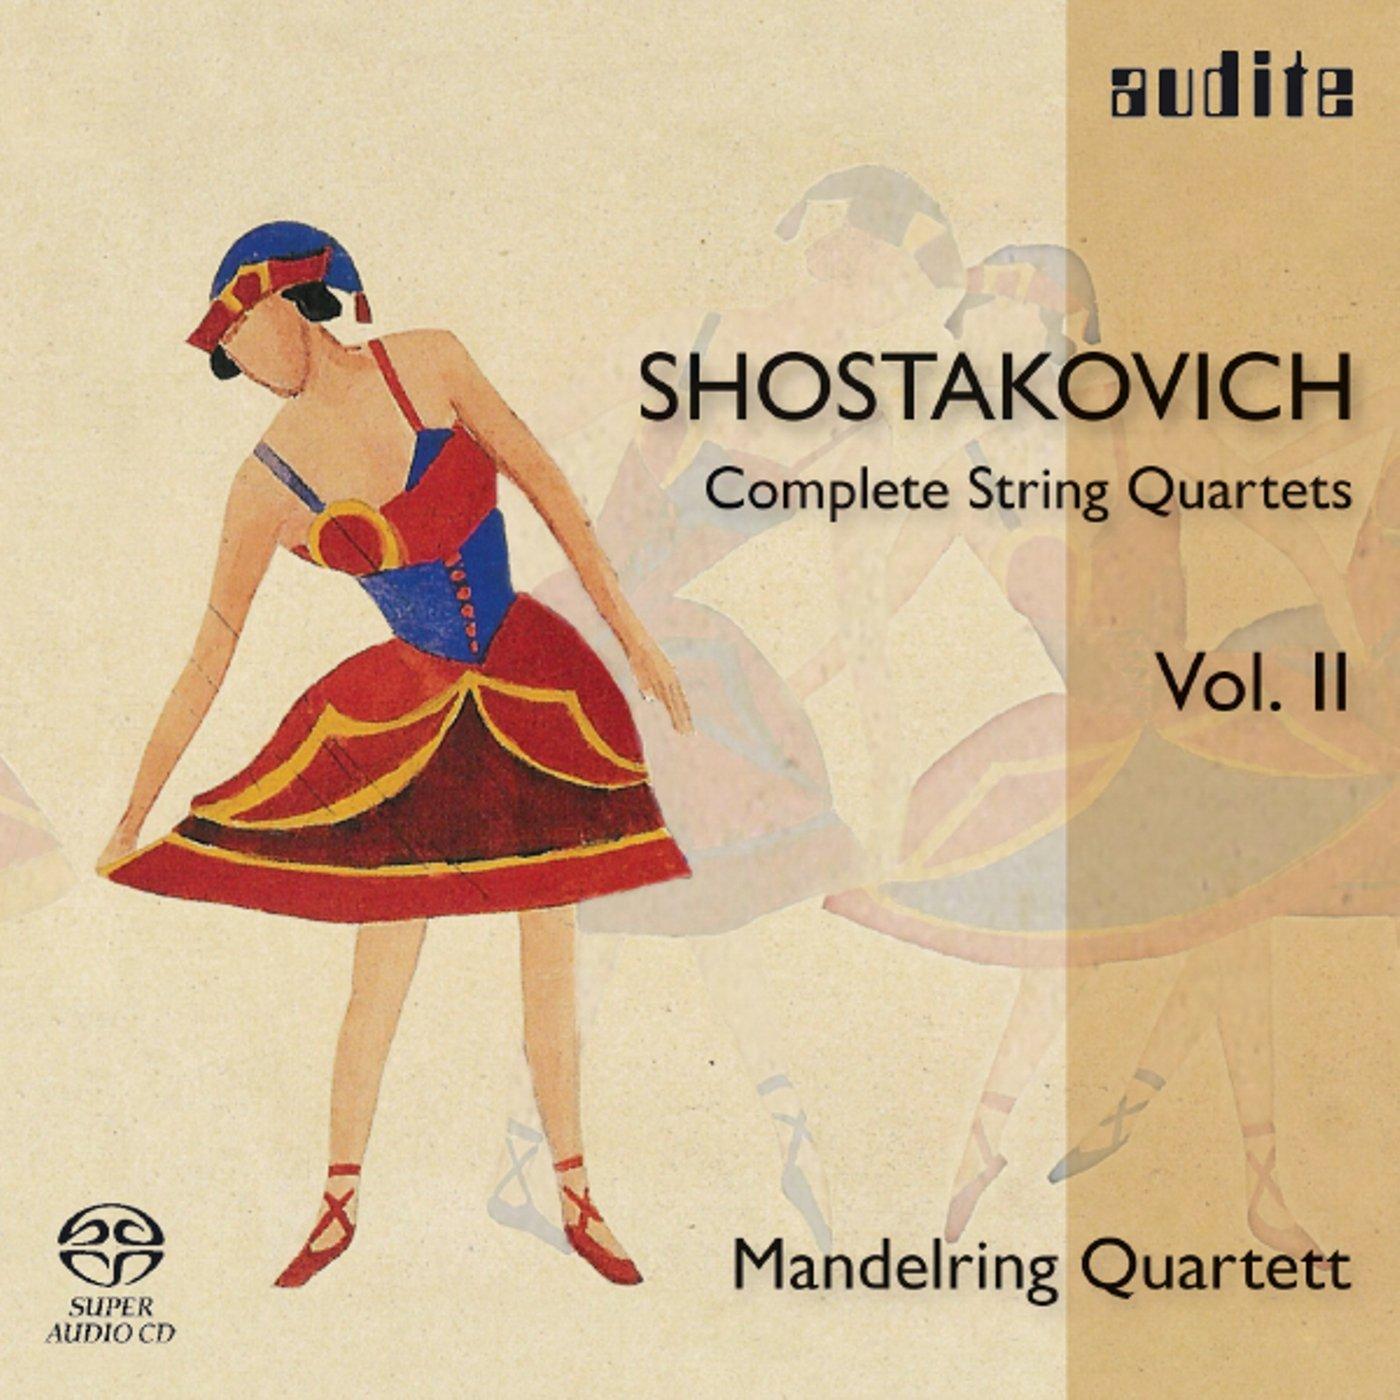 SHOSTAKOVICH / MANDELRING QUARTET